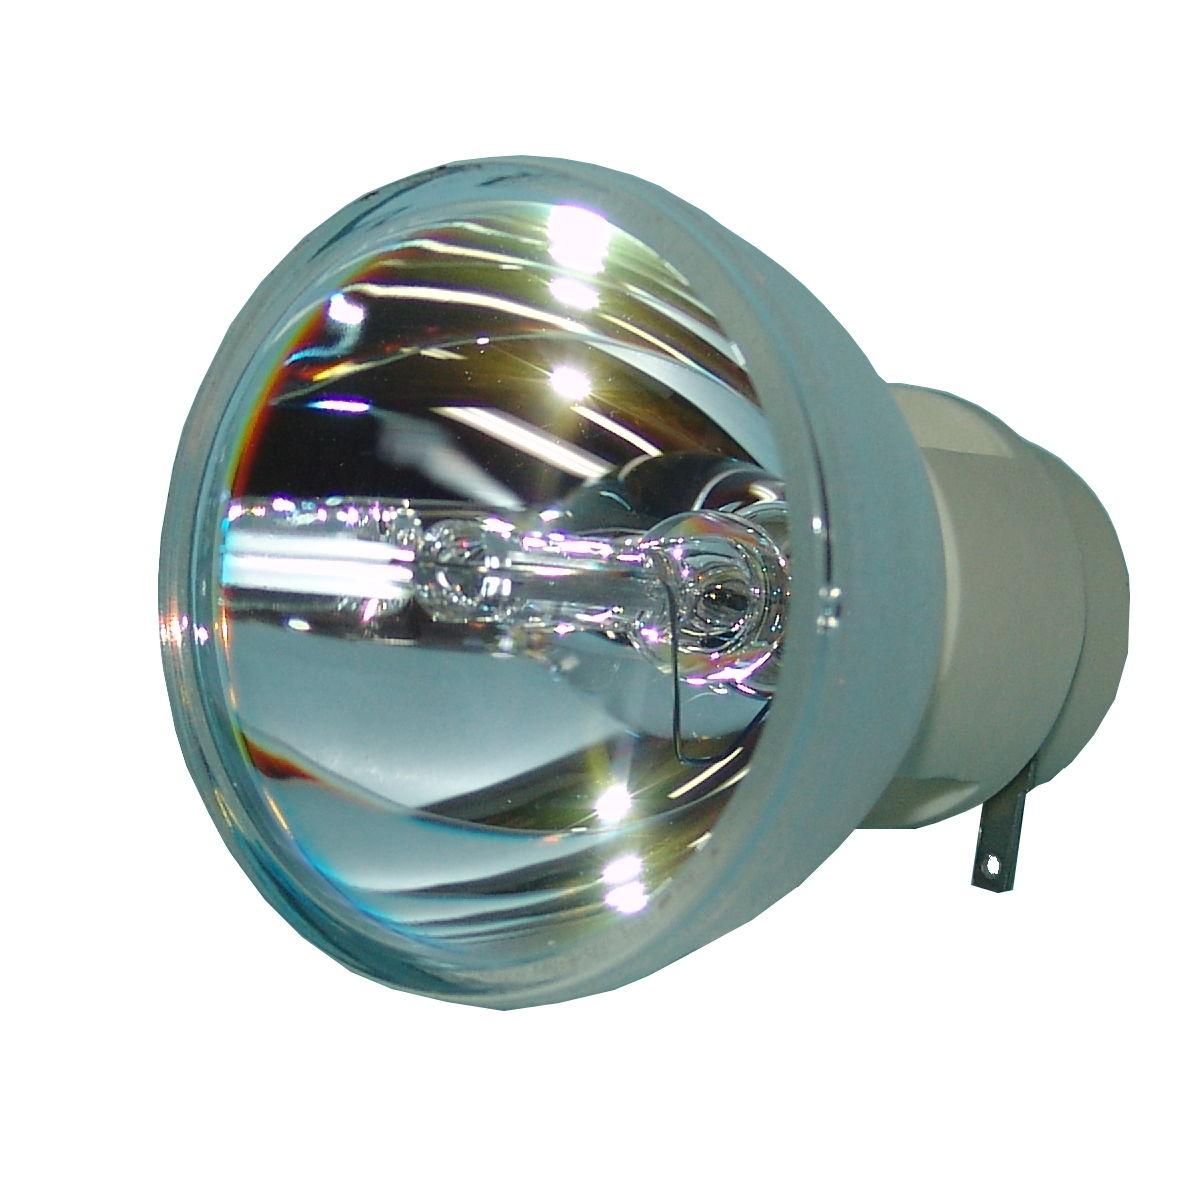 Фотография Osram Bare Lamp  ECJ9300001  For Acer  P5200 P5290  P5390W  Projector DLP LCD Bulb